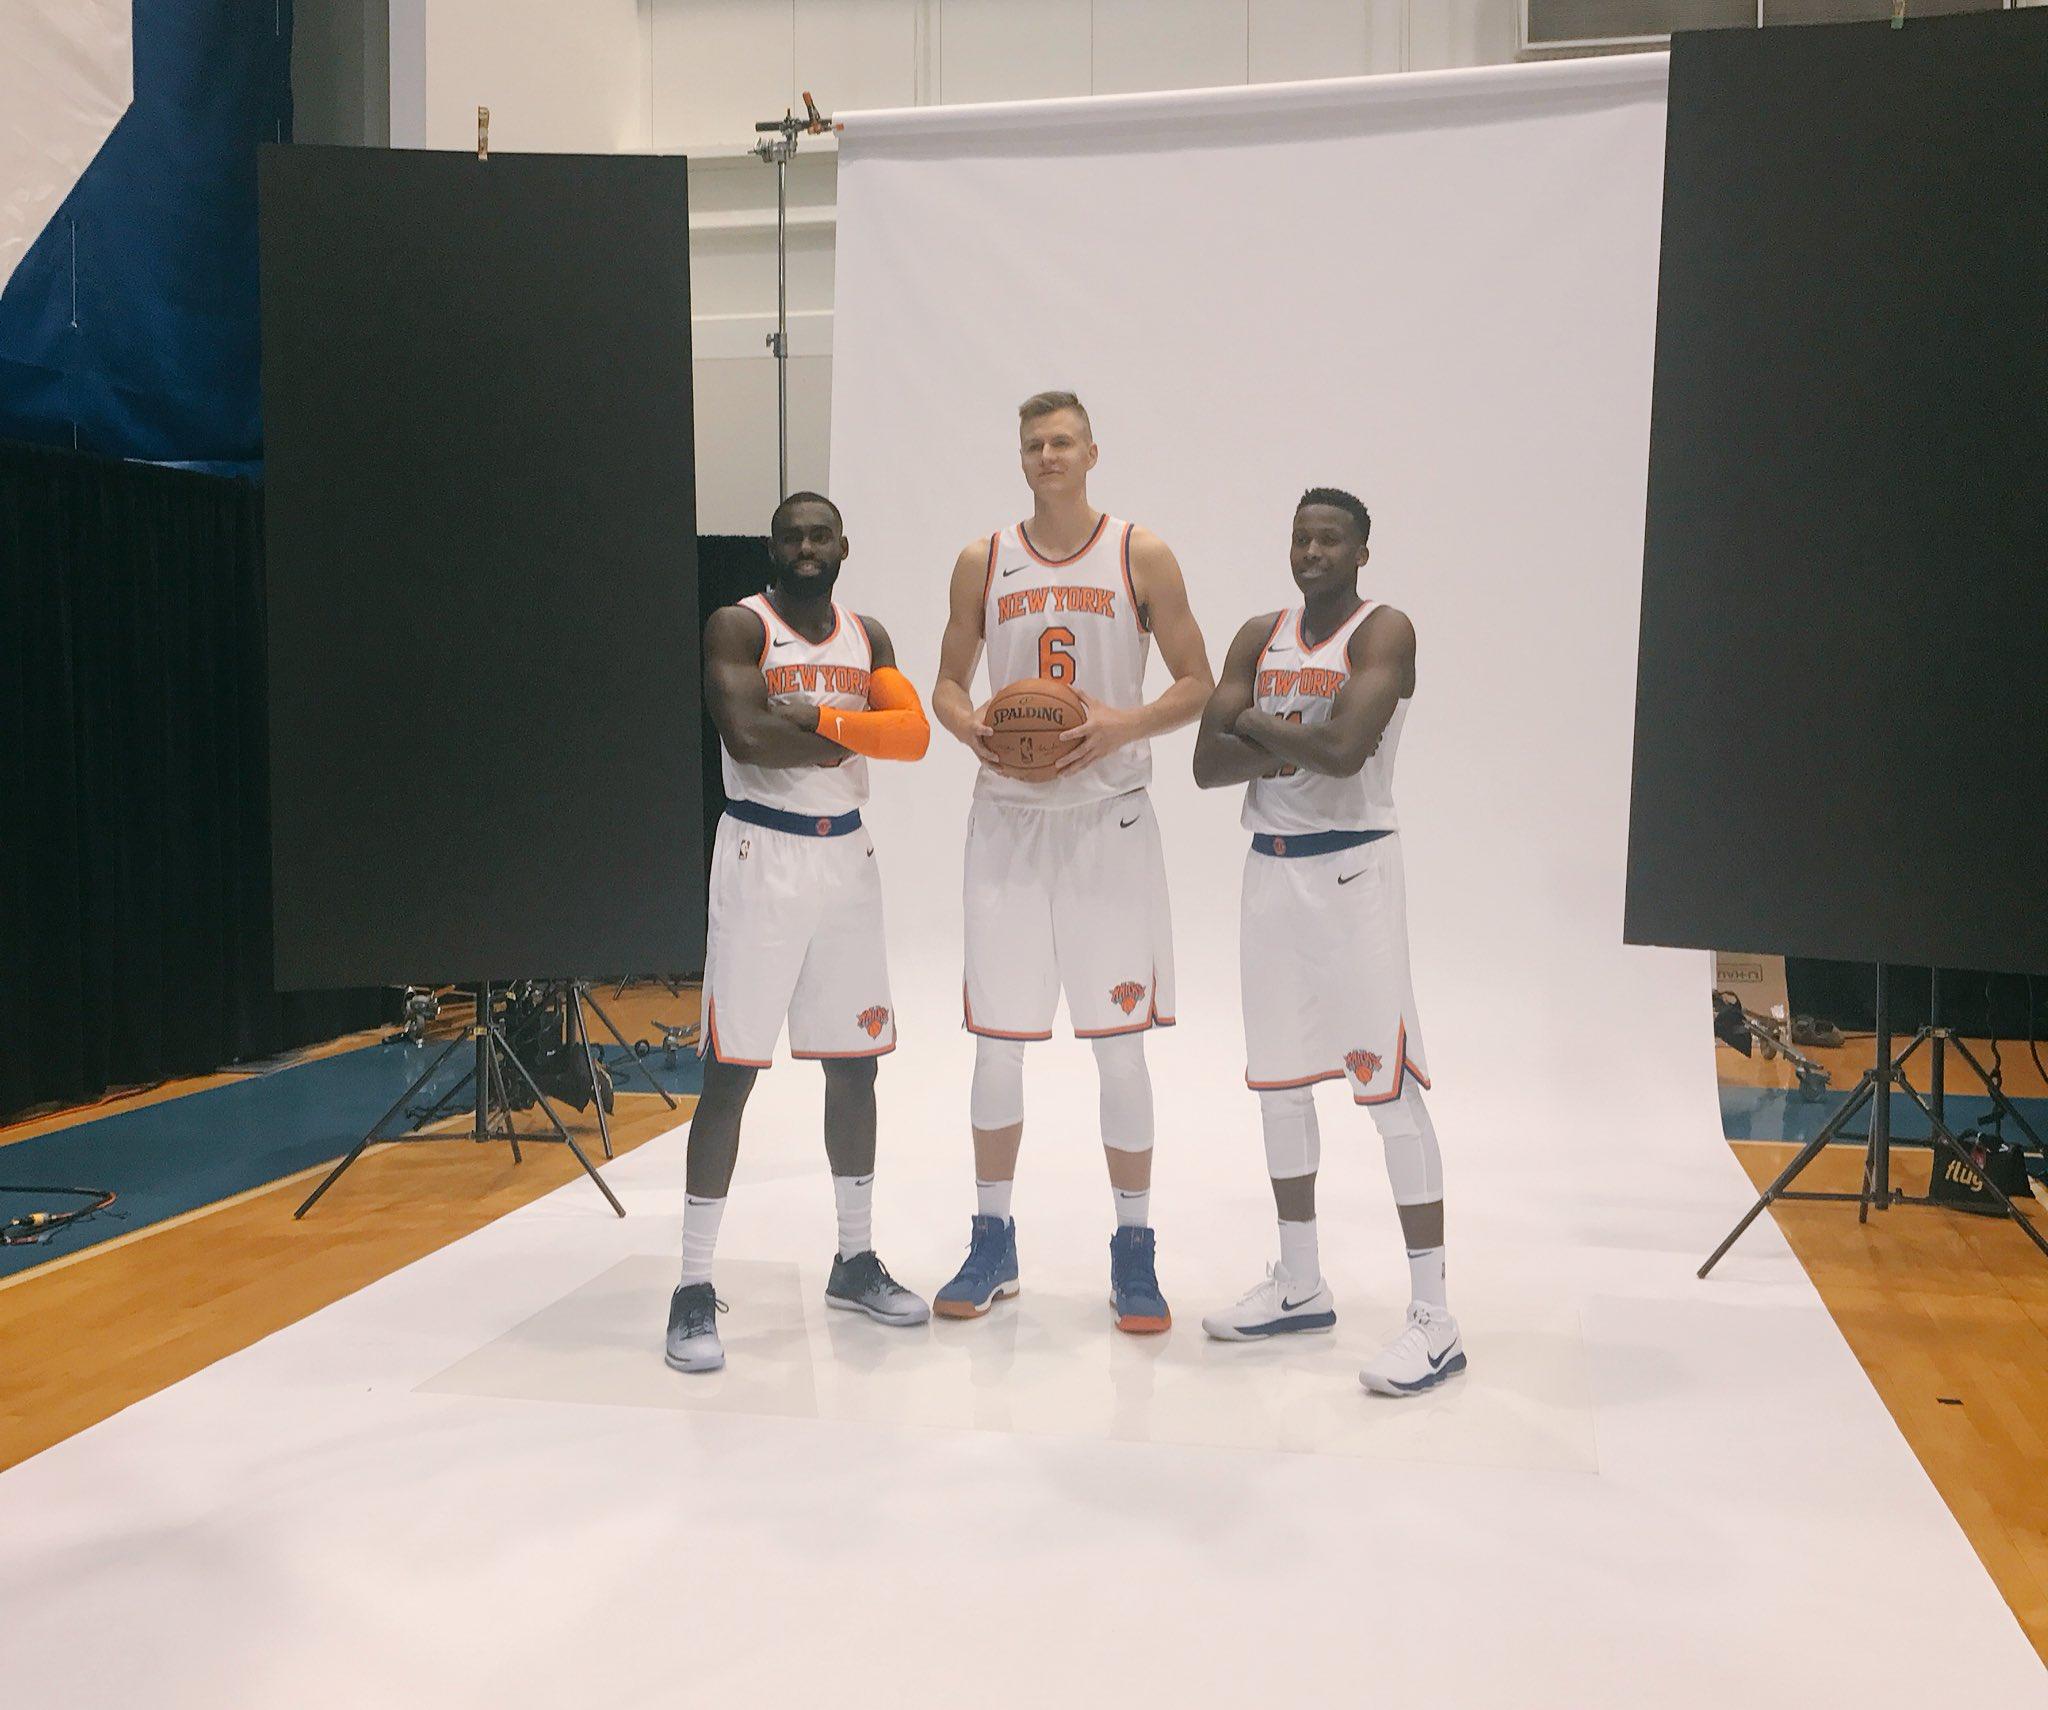 Squad. https://t.co/cW0V2m7Mzy